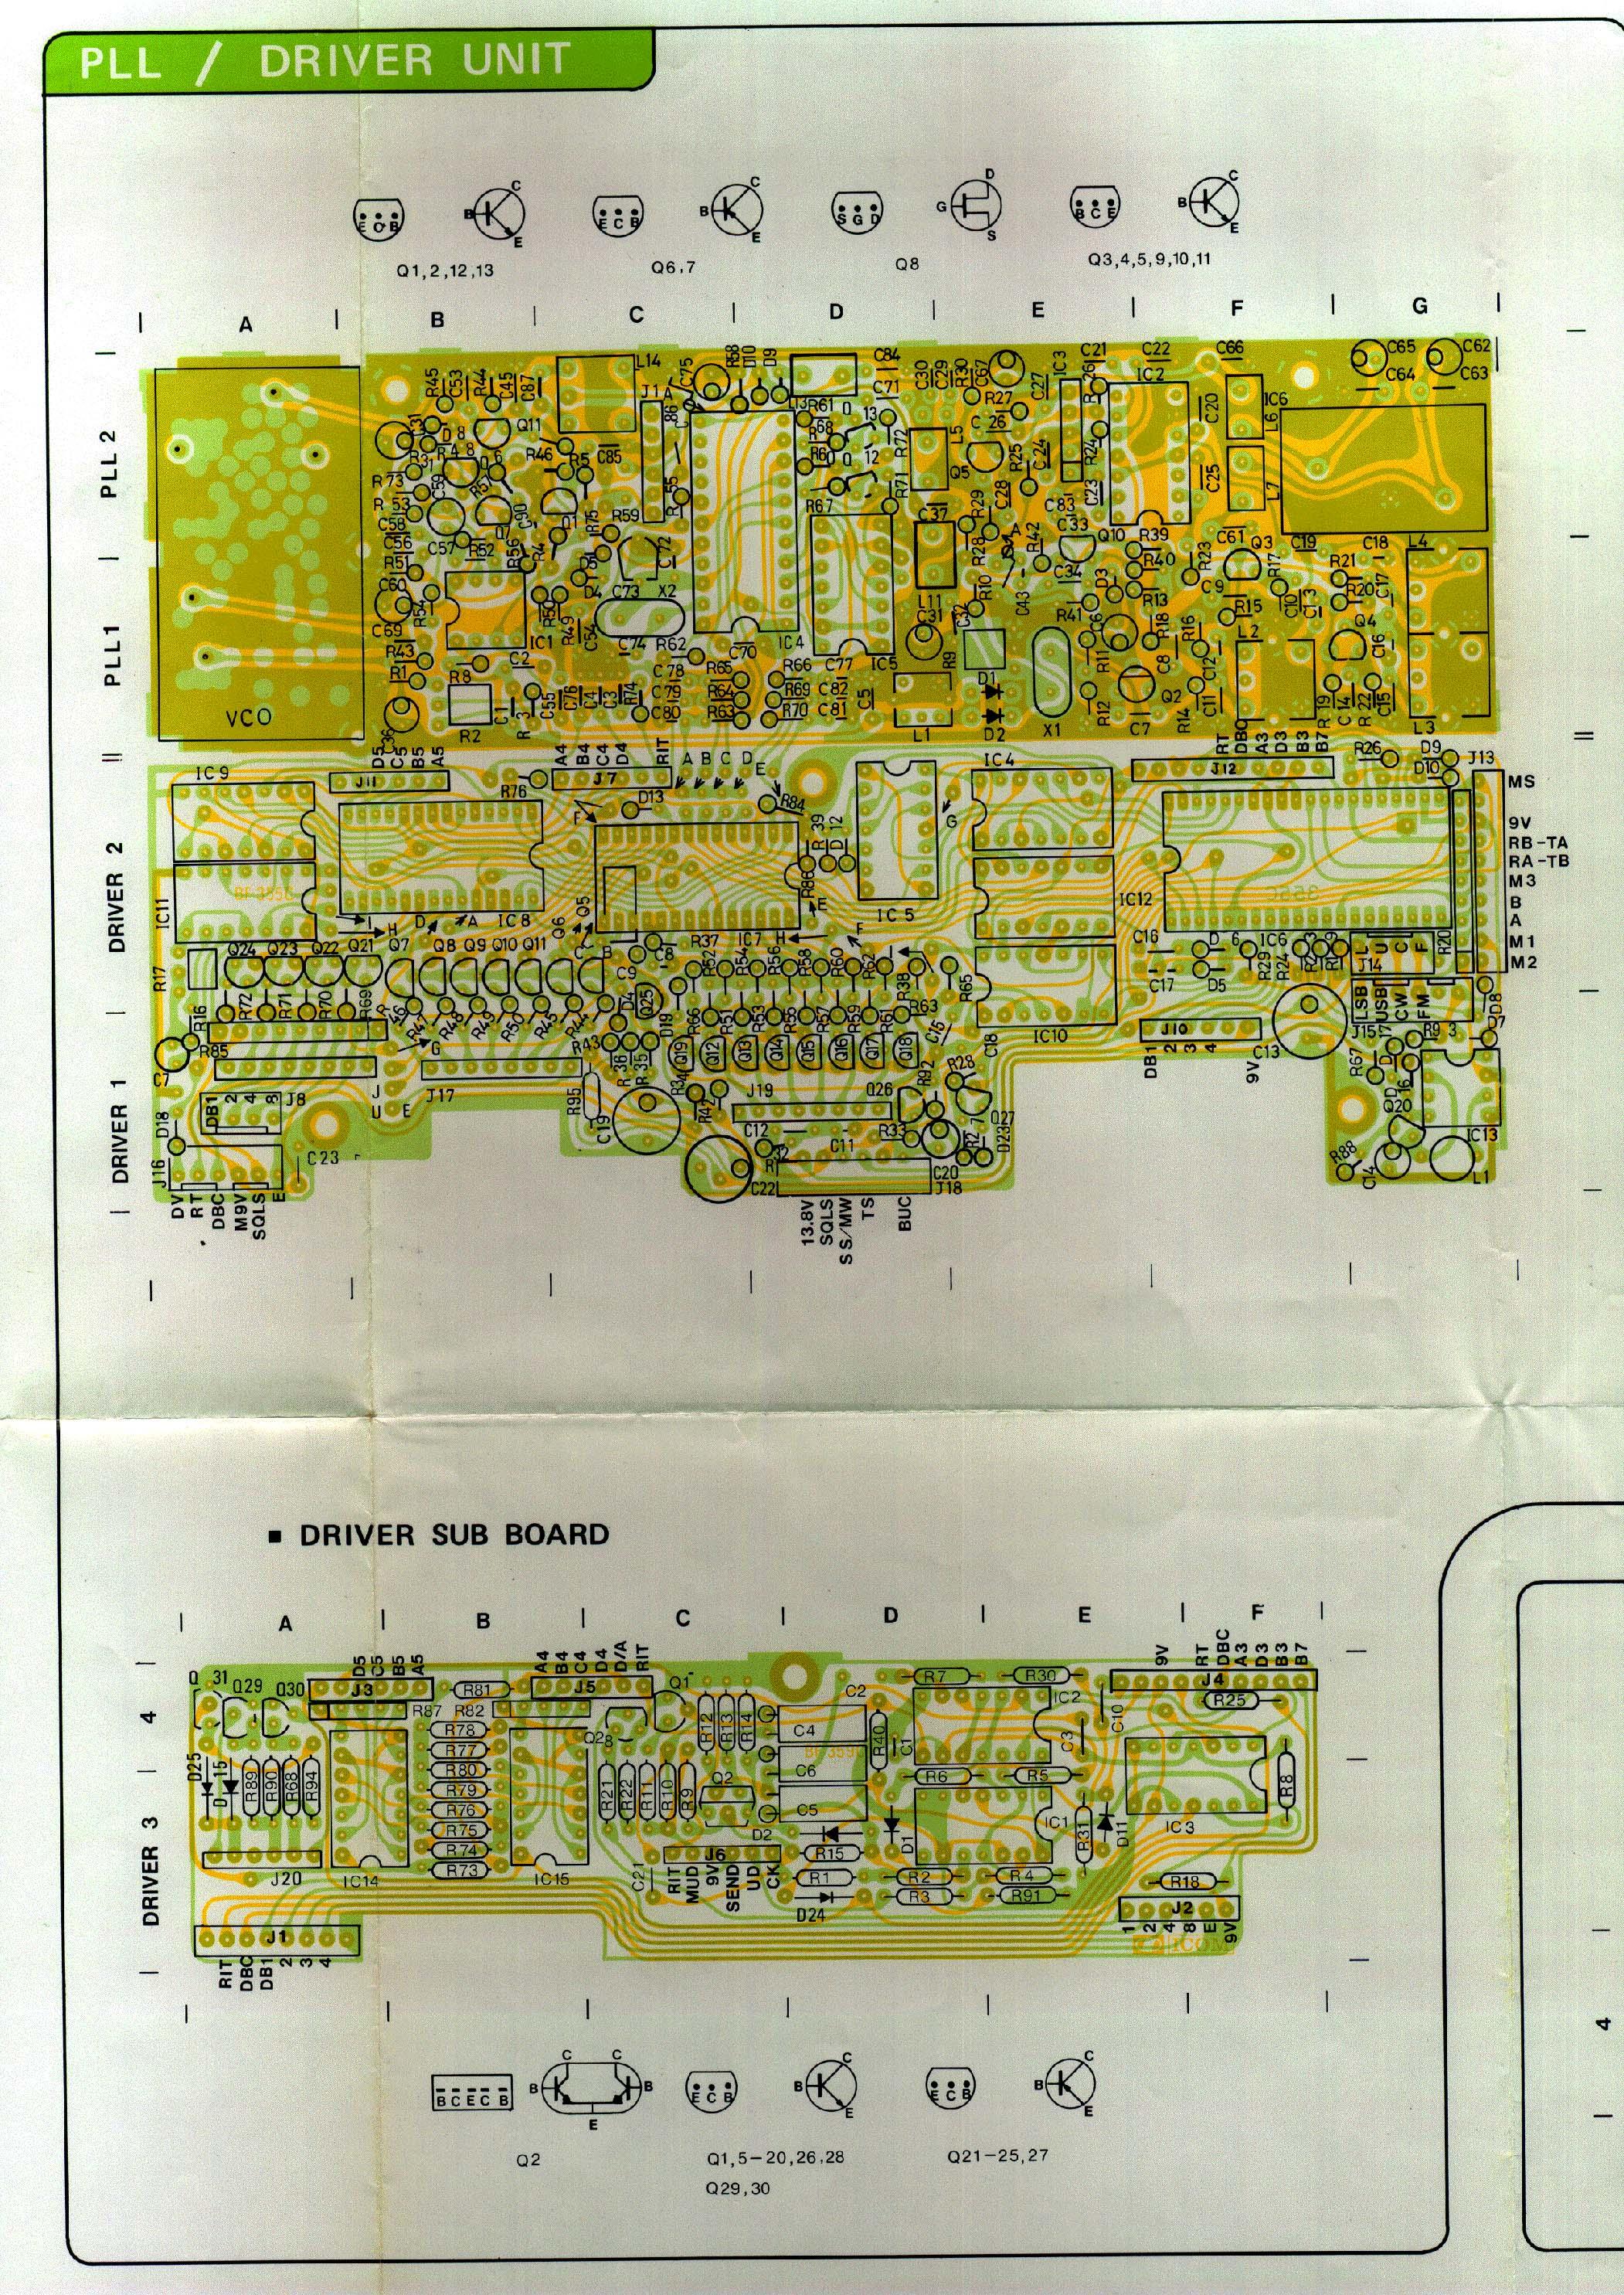 icom-pll Radio Schematics Diagrams on digital multimeter, computer circuit board, hvac system, sony tv, samsung lcd tv,